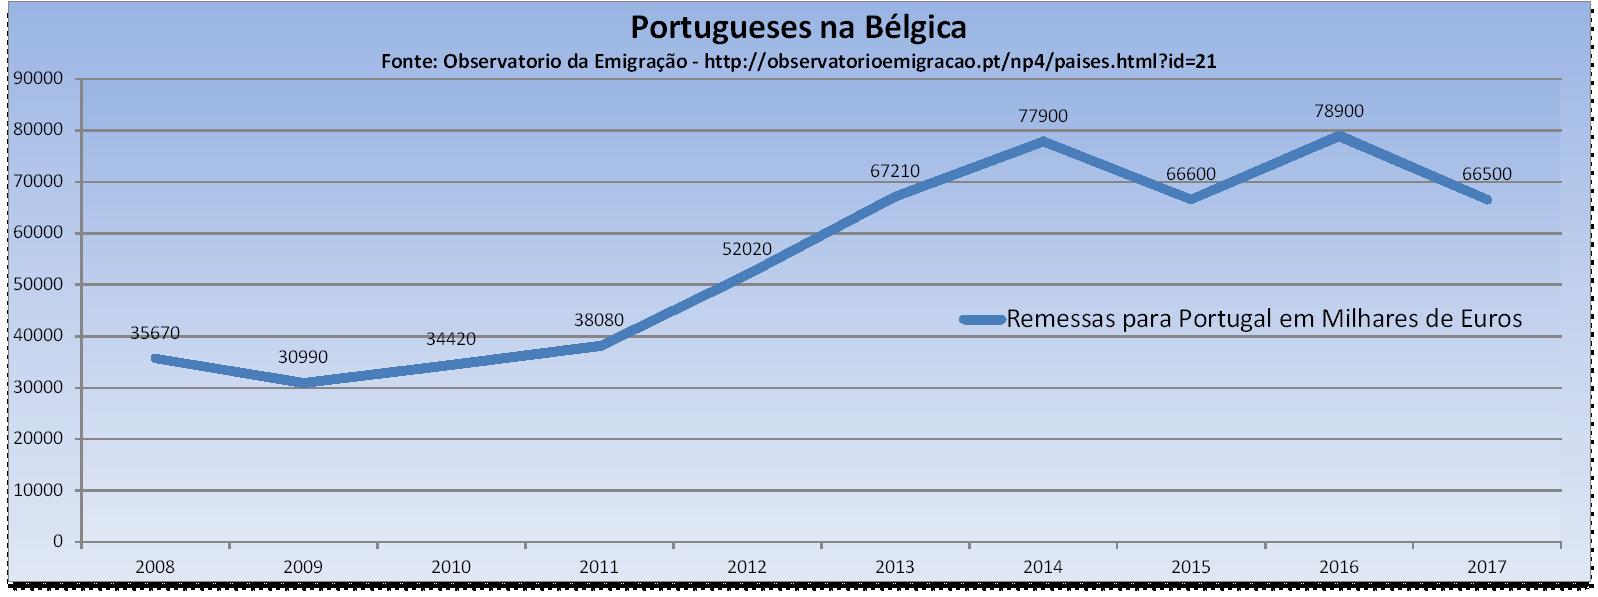 Remessas Portugueses na Bélgica